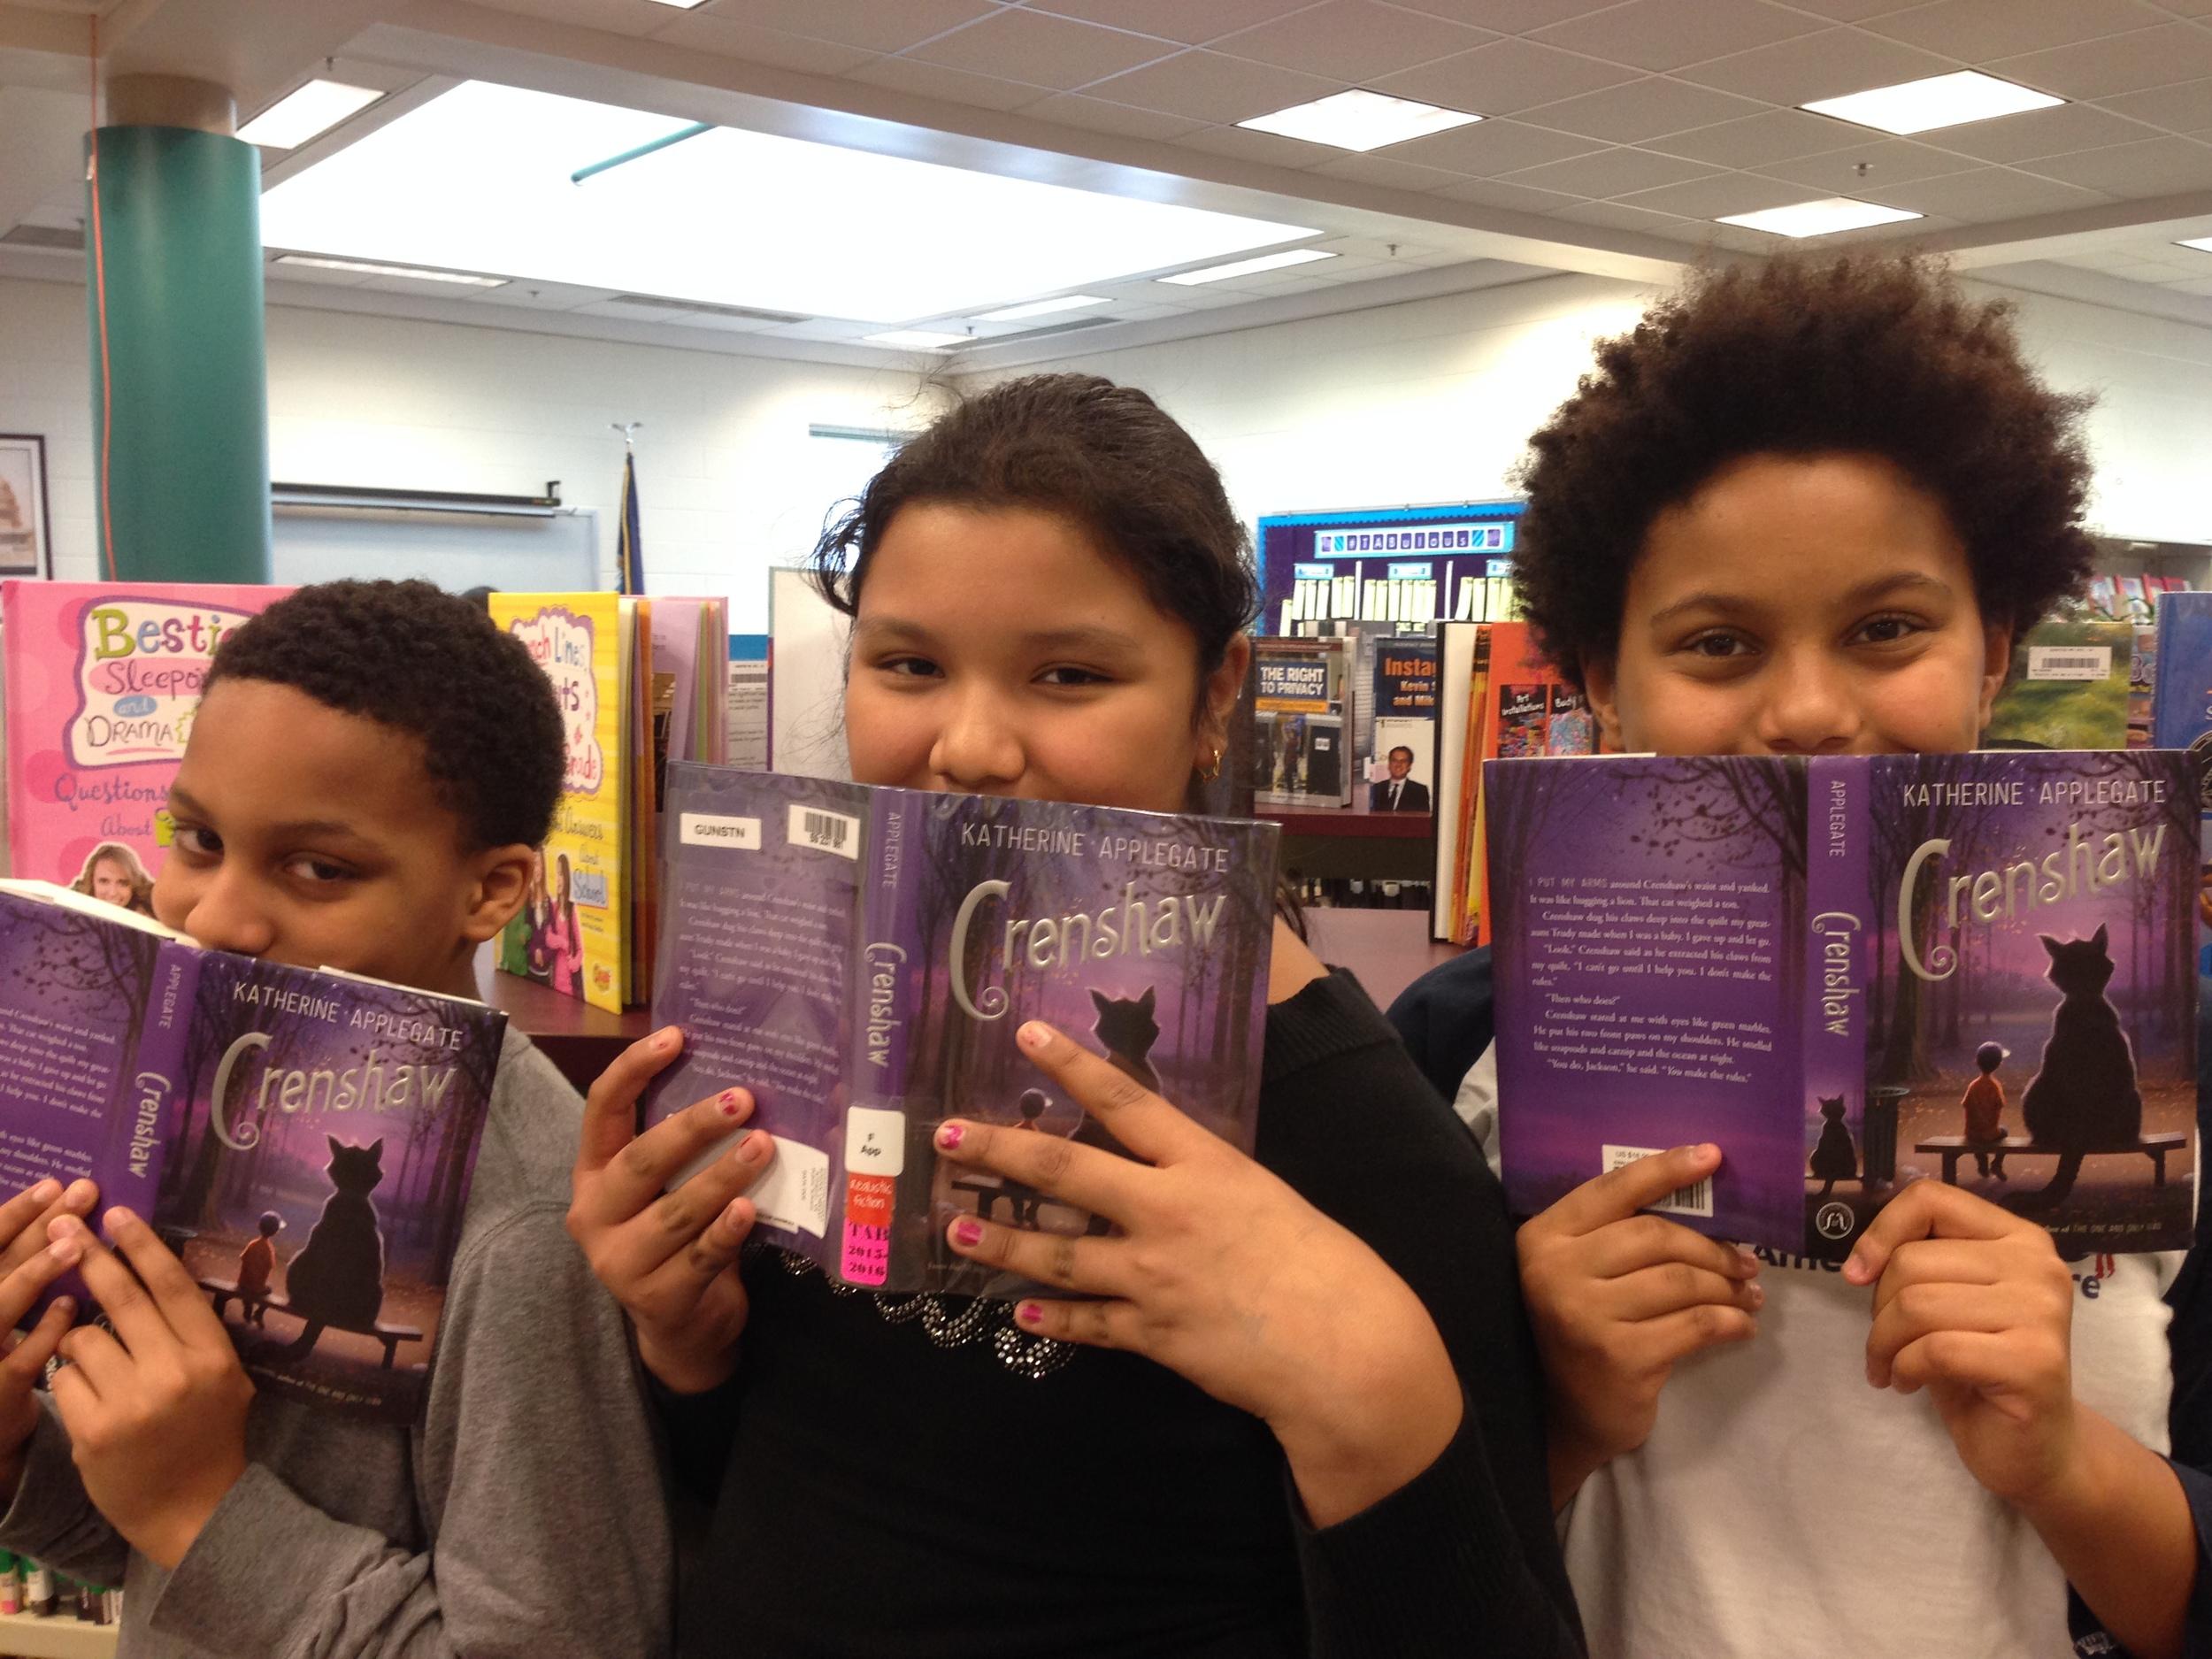 Gunston Middle schoolers Markel, Jhandira, and Amelia